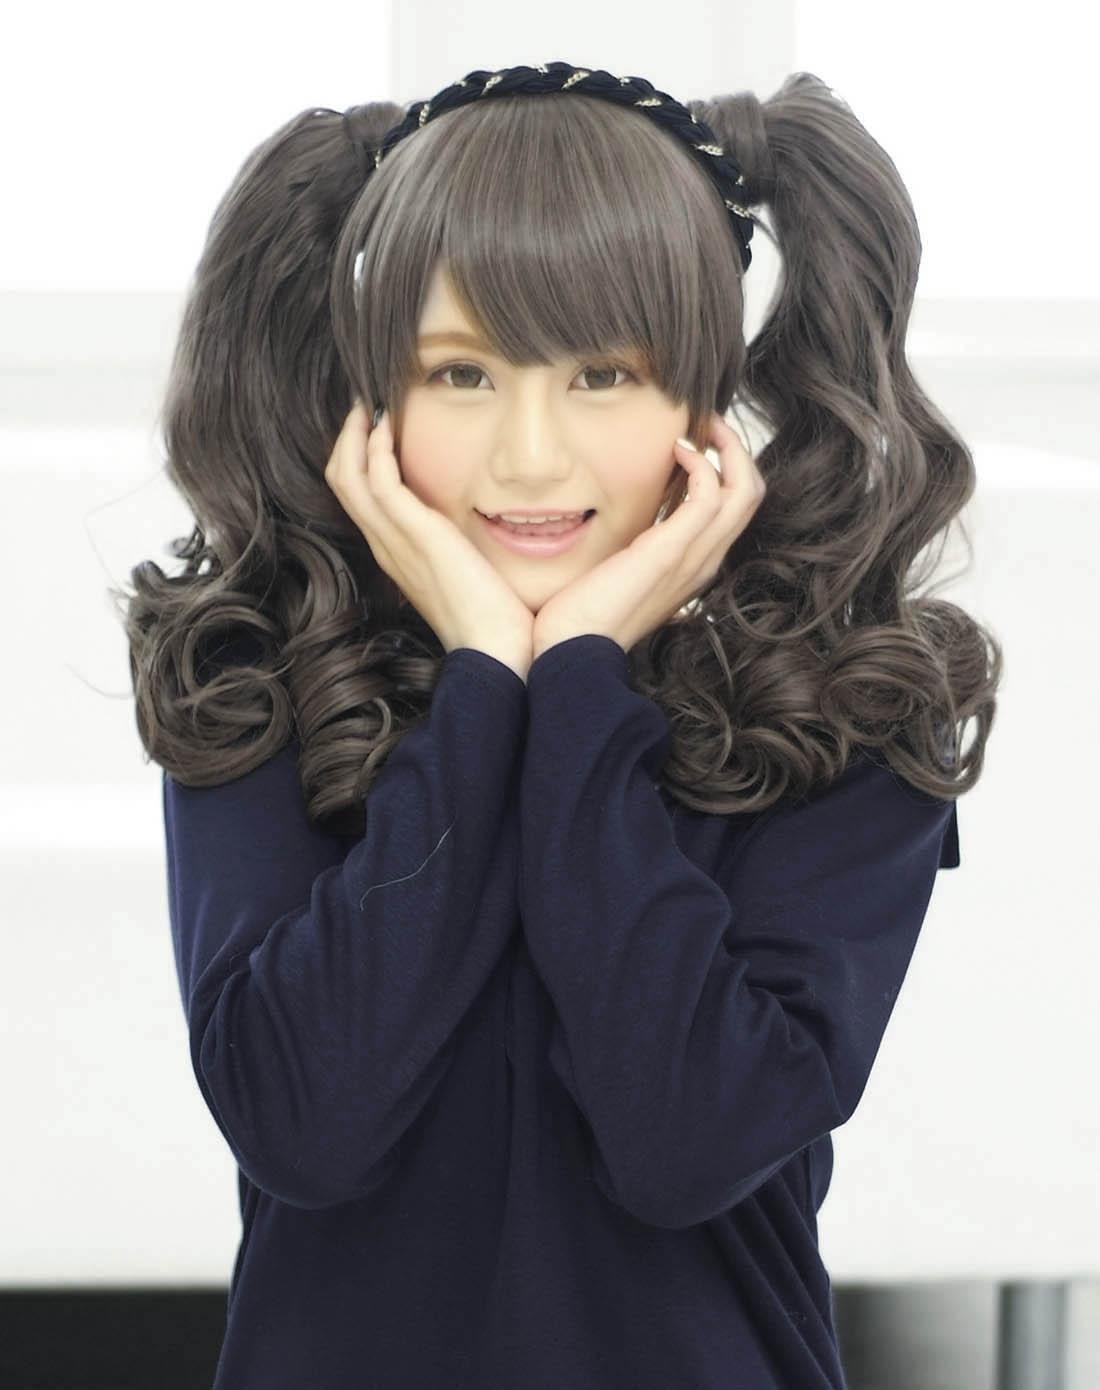 aqua doll 独家新款魔术贴卷发马尾 时尚可爱 华丽摩登 黑色,双马尾